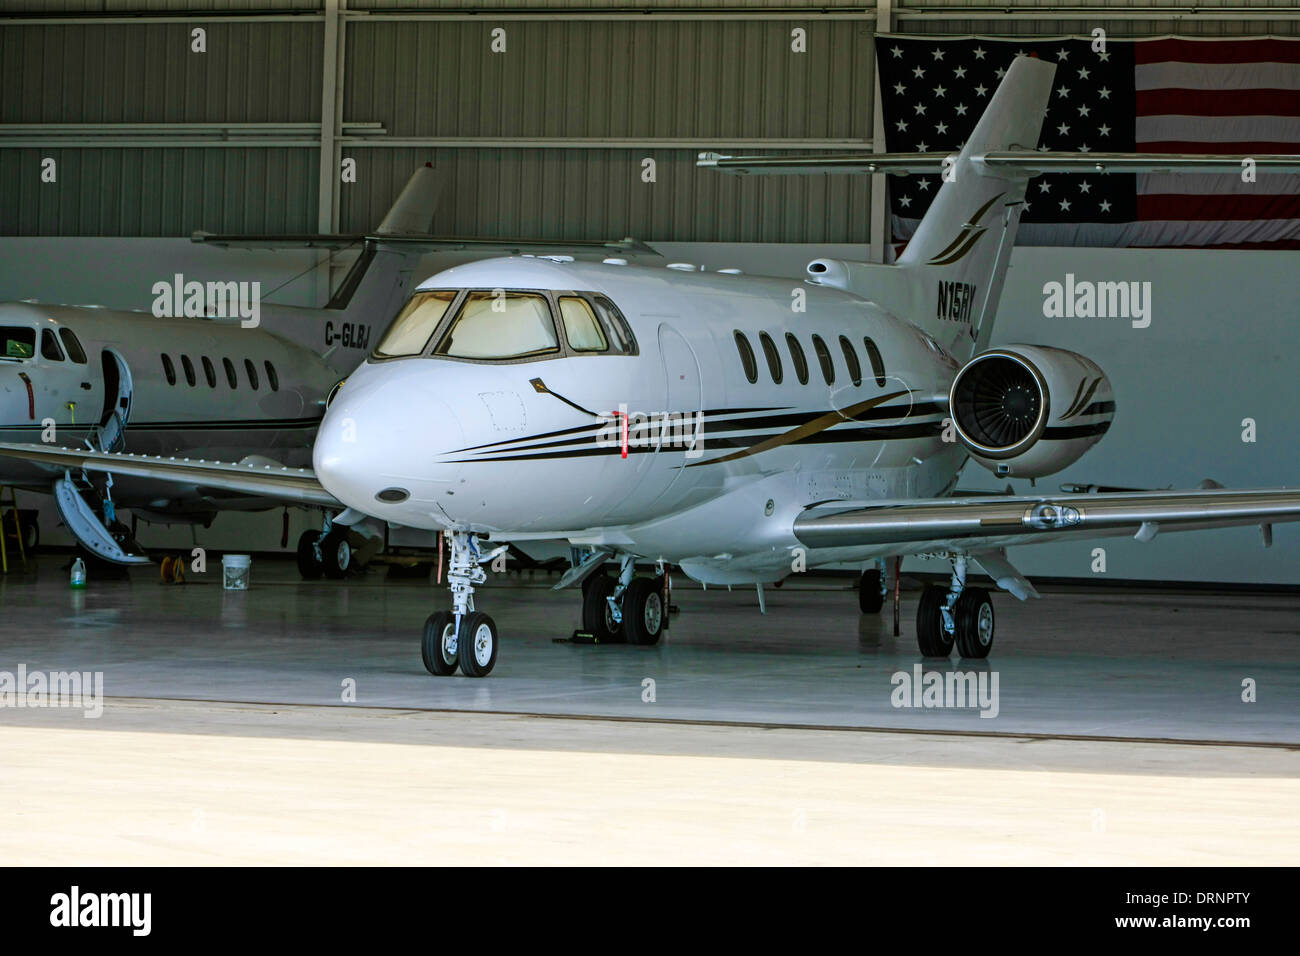 Raytheon Aircraft Company Hawker 800xp - Stock Image